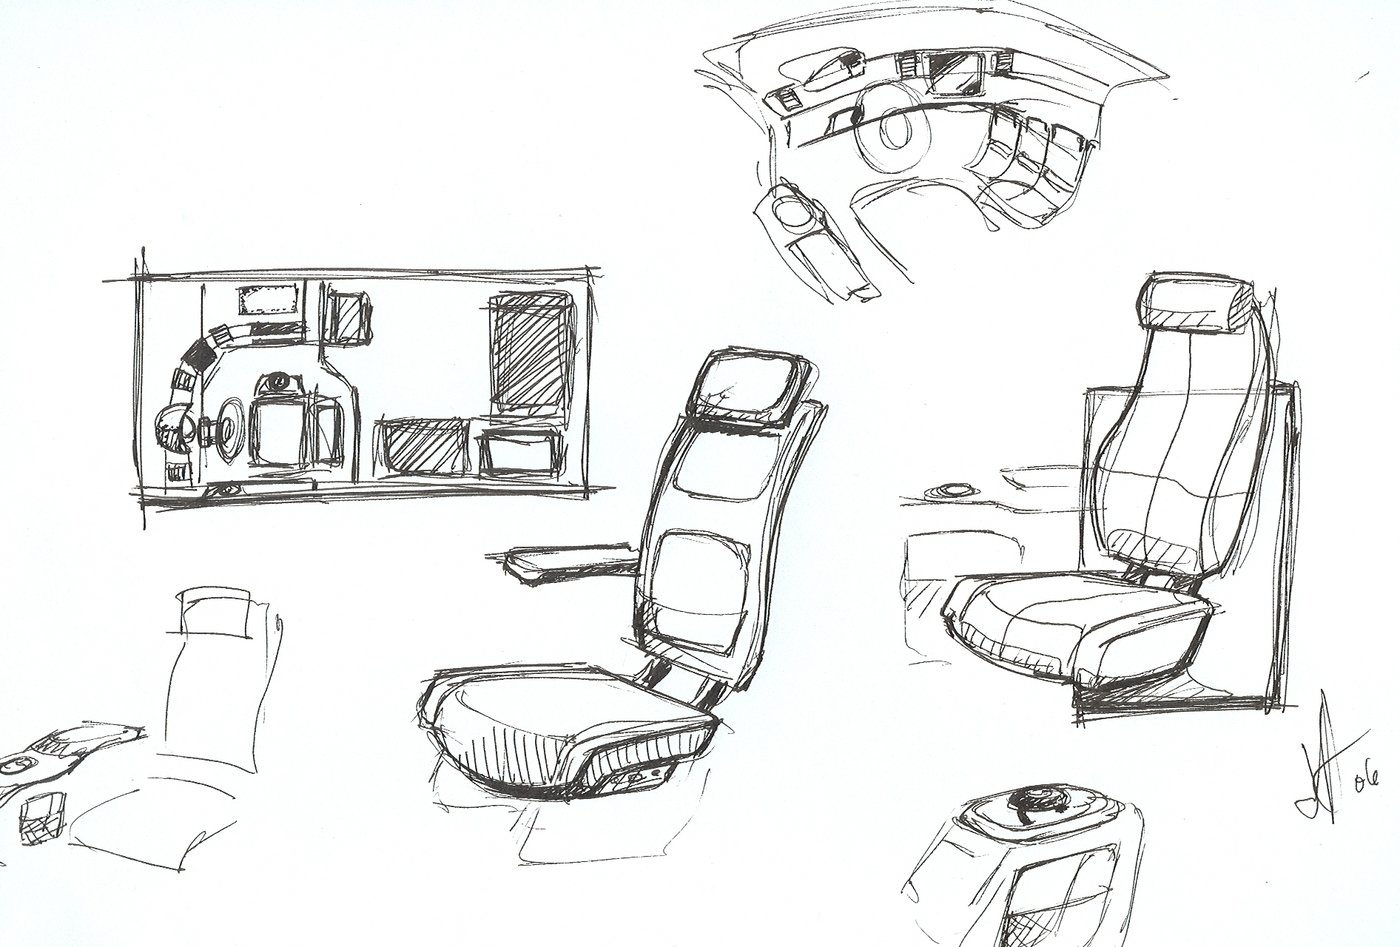 Older projects by Joshua Howard at Coroflot.com